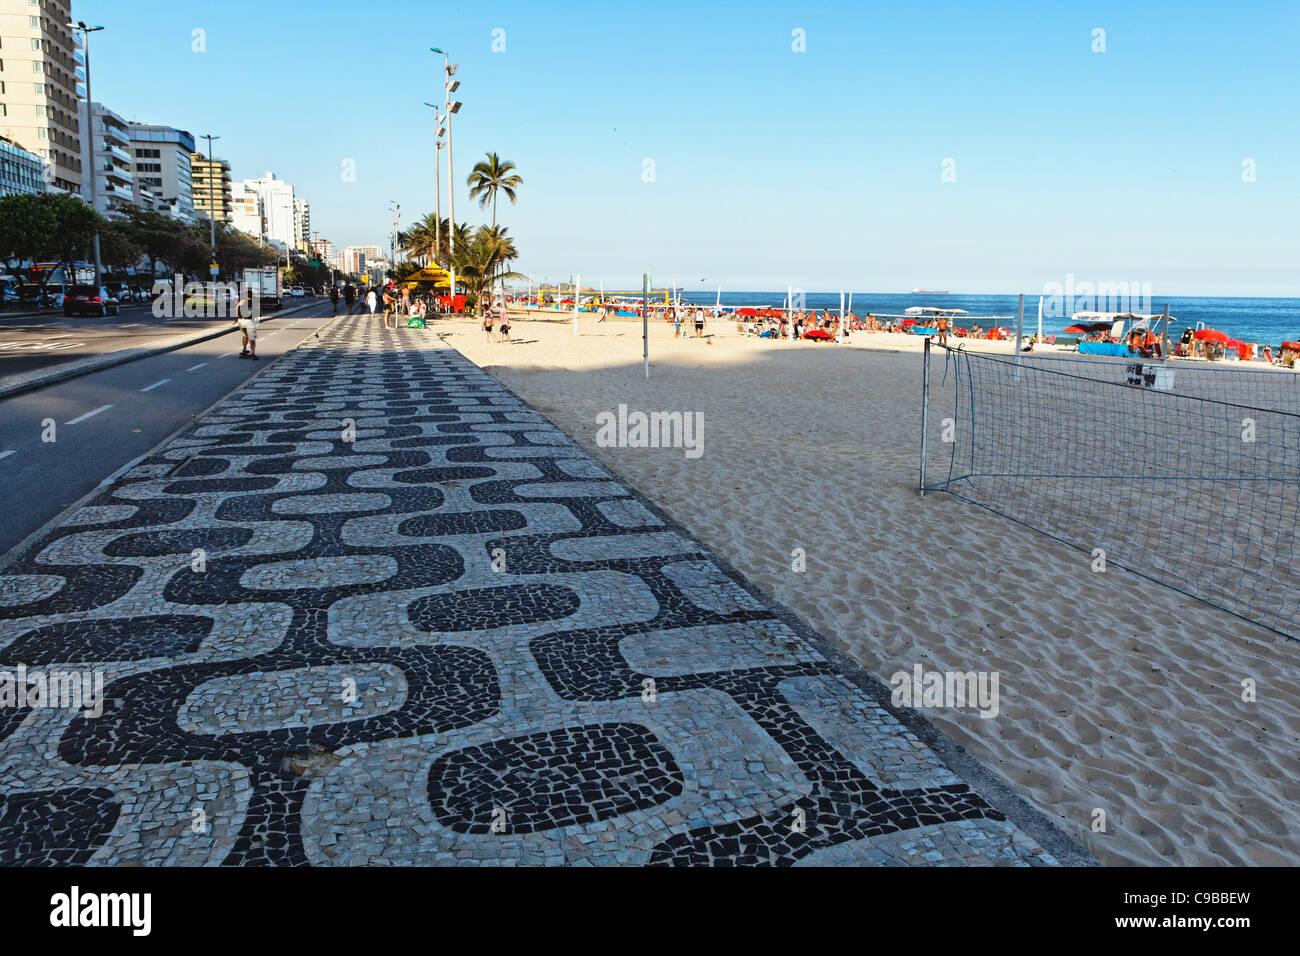 Patterned Walkway of Ipanema Beach, Rio de Janeiro, Brazil - Stock Image